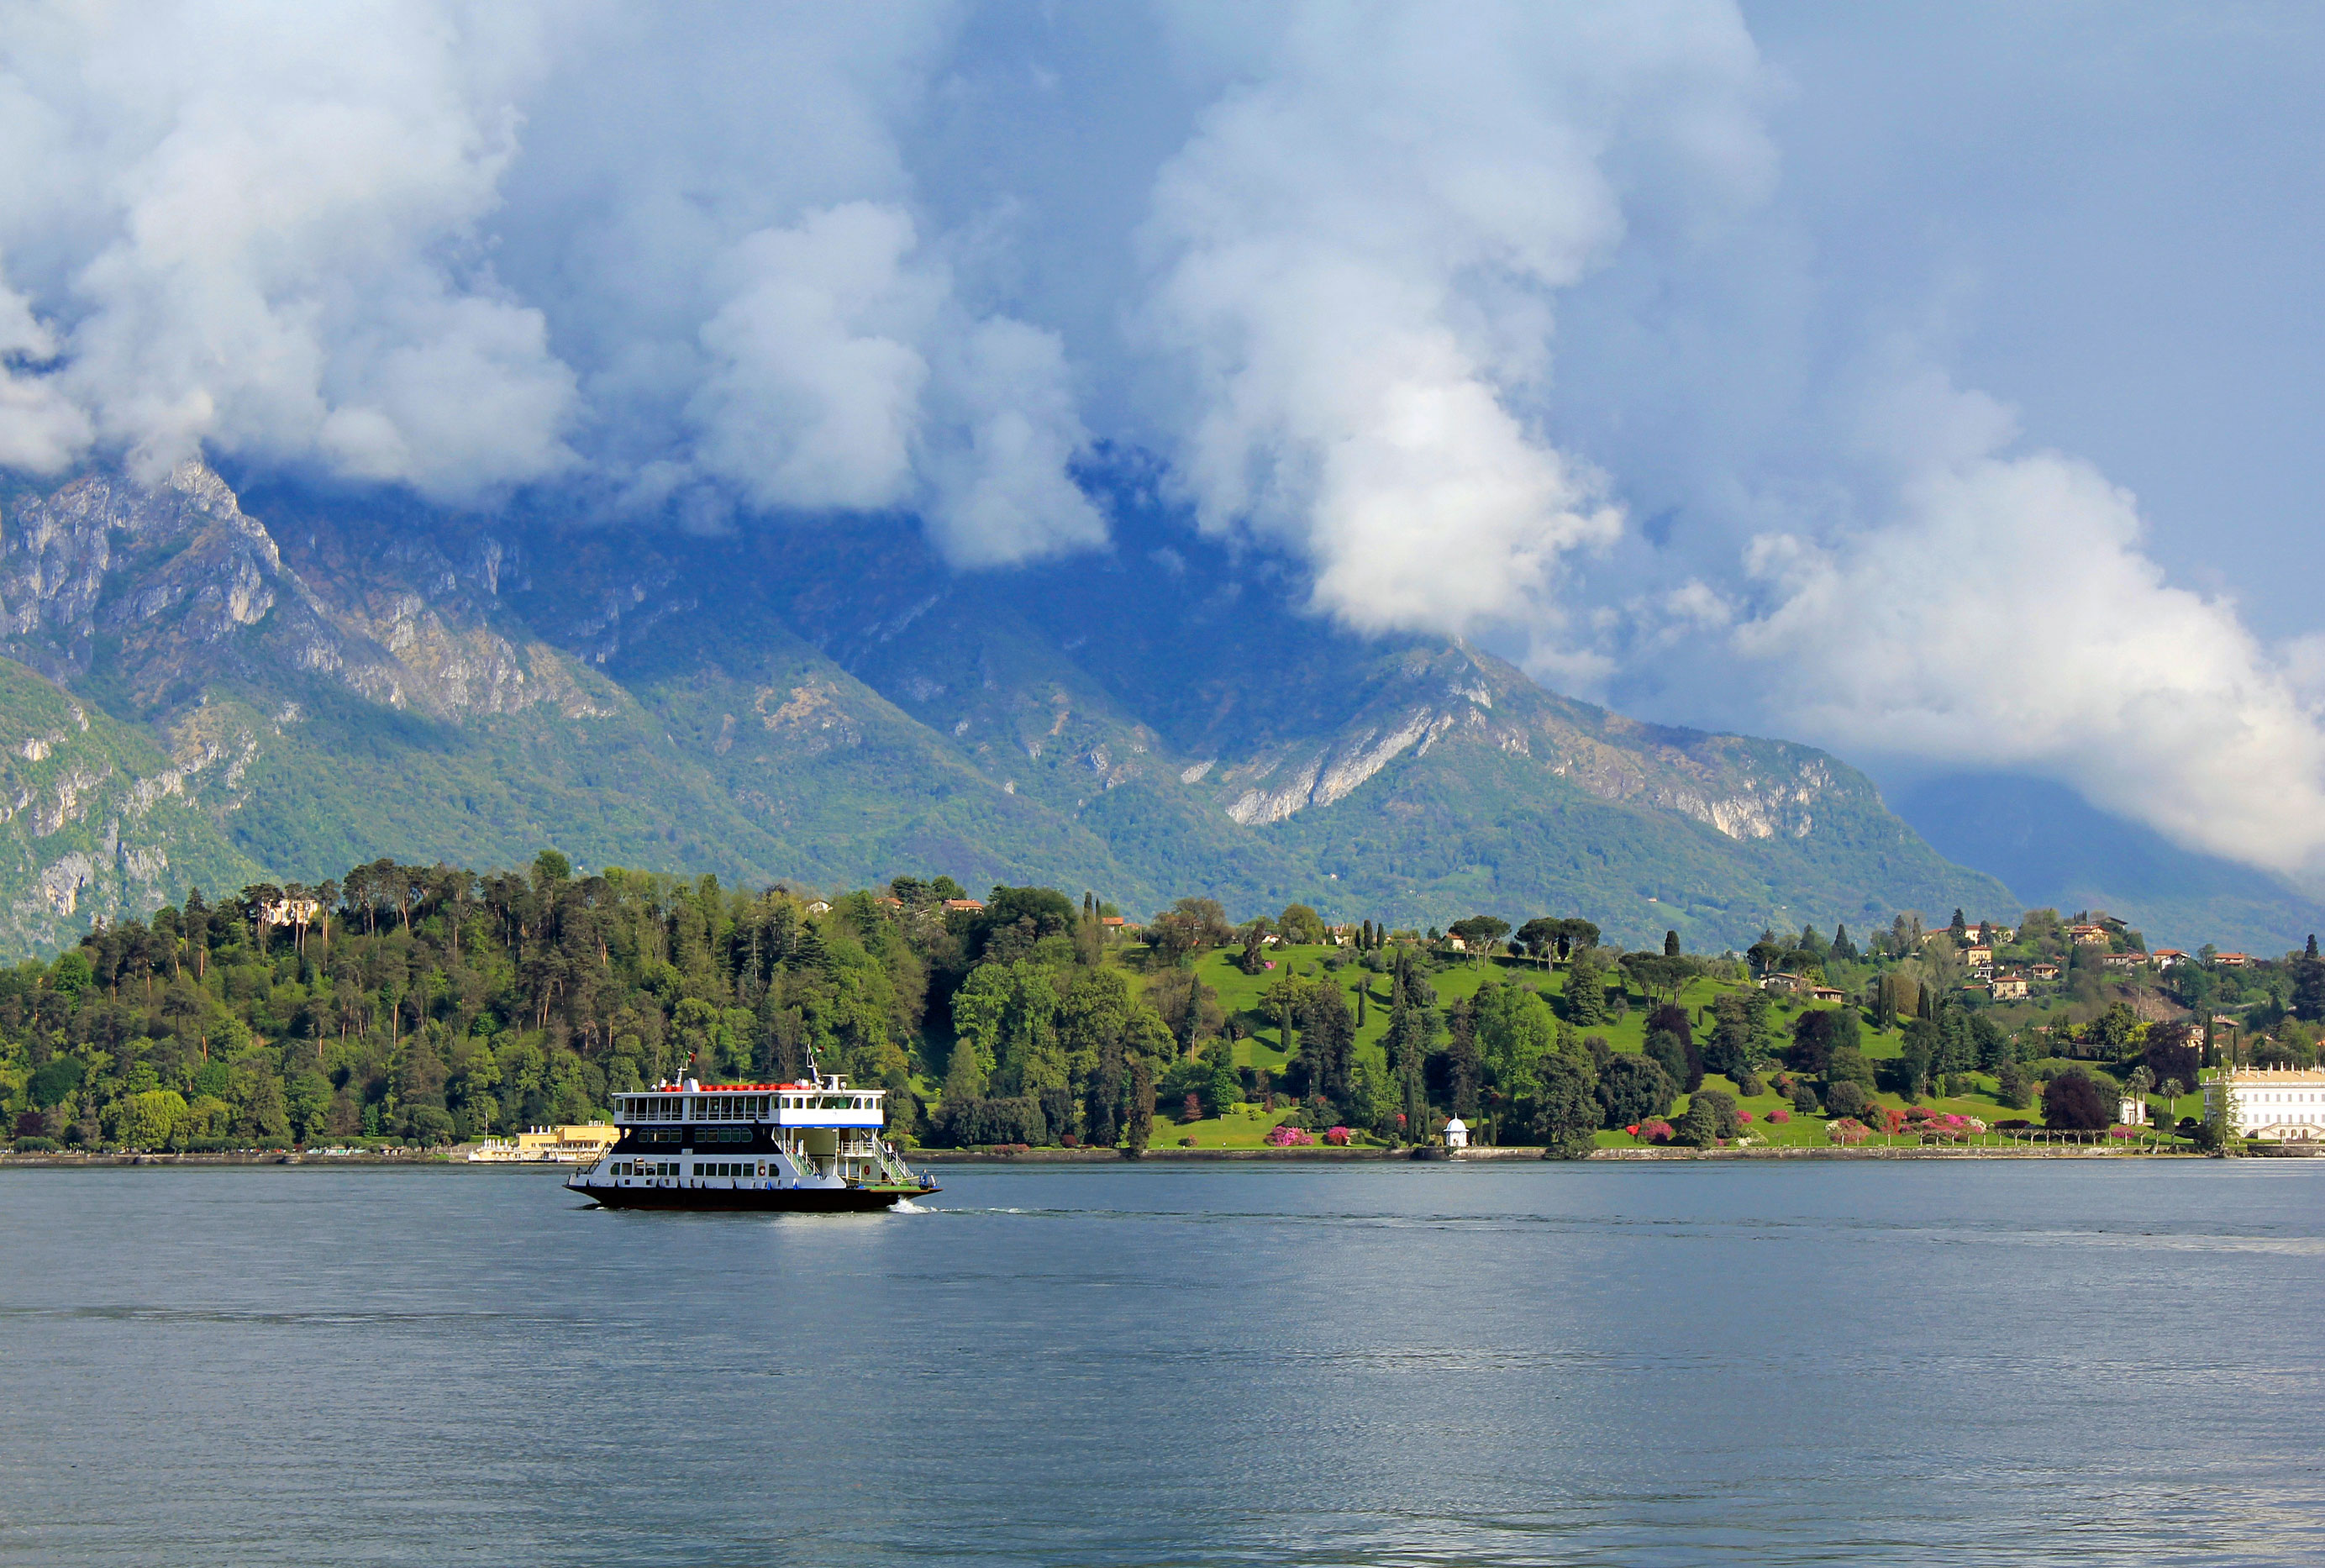 A Boat Transports Tourists on Lake Como